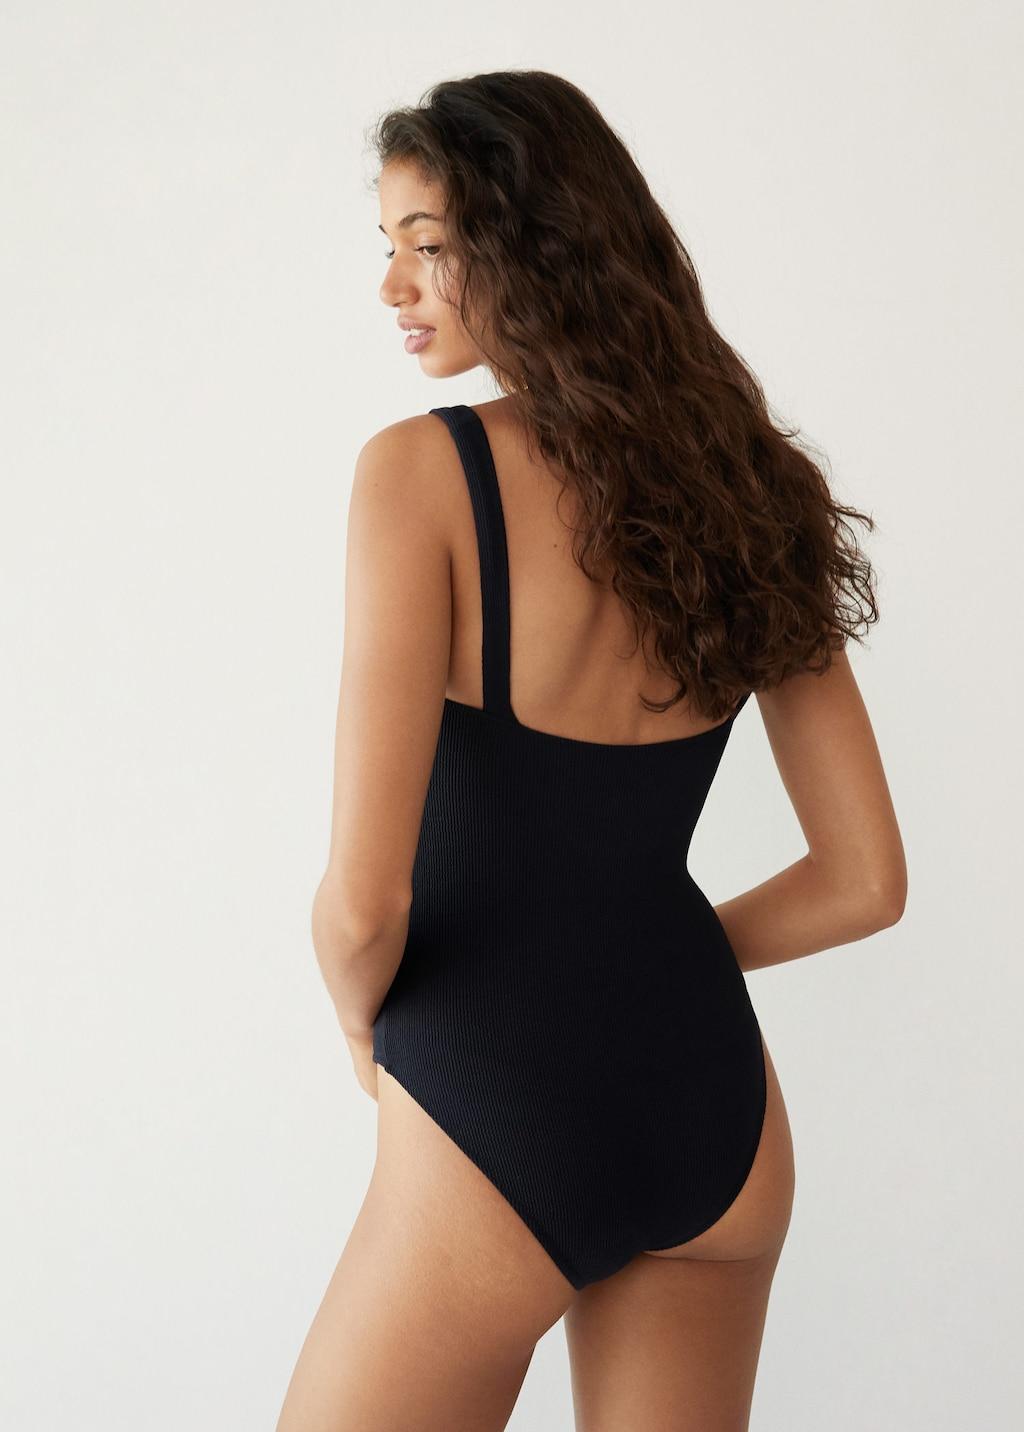 affordbale minimalist swimsuit — under $100 black one-piece swimwear with modest full coverage butt